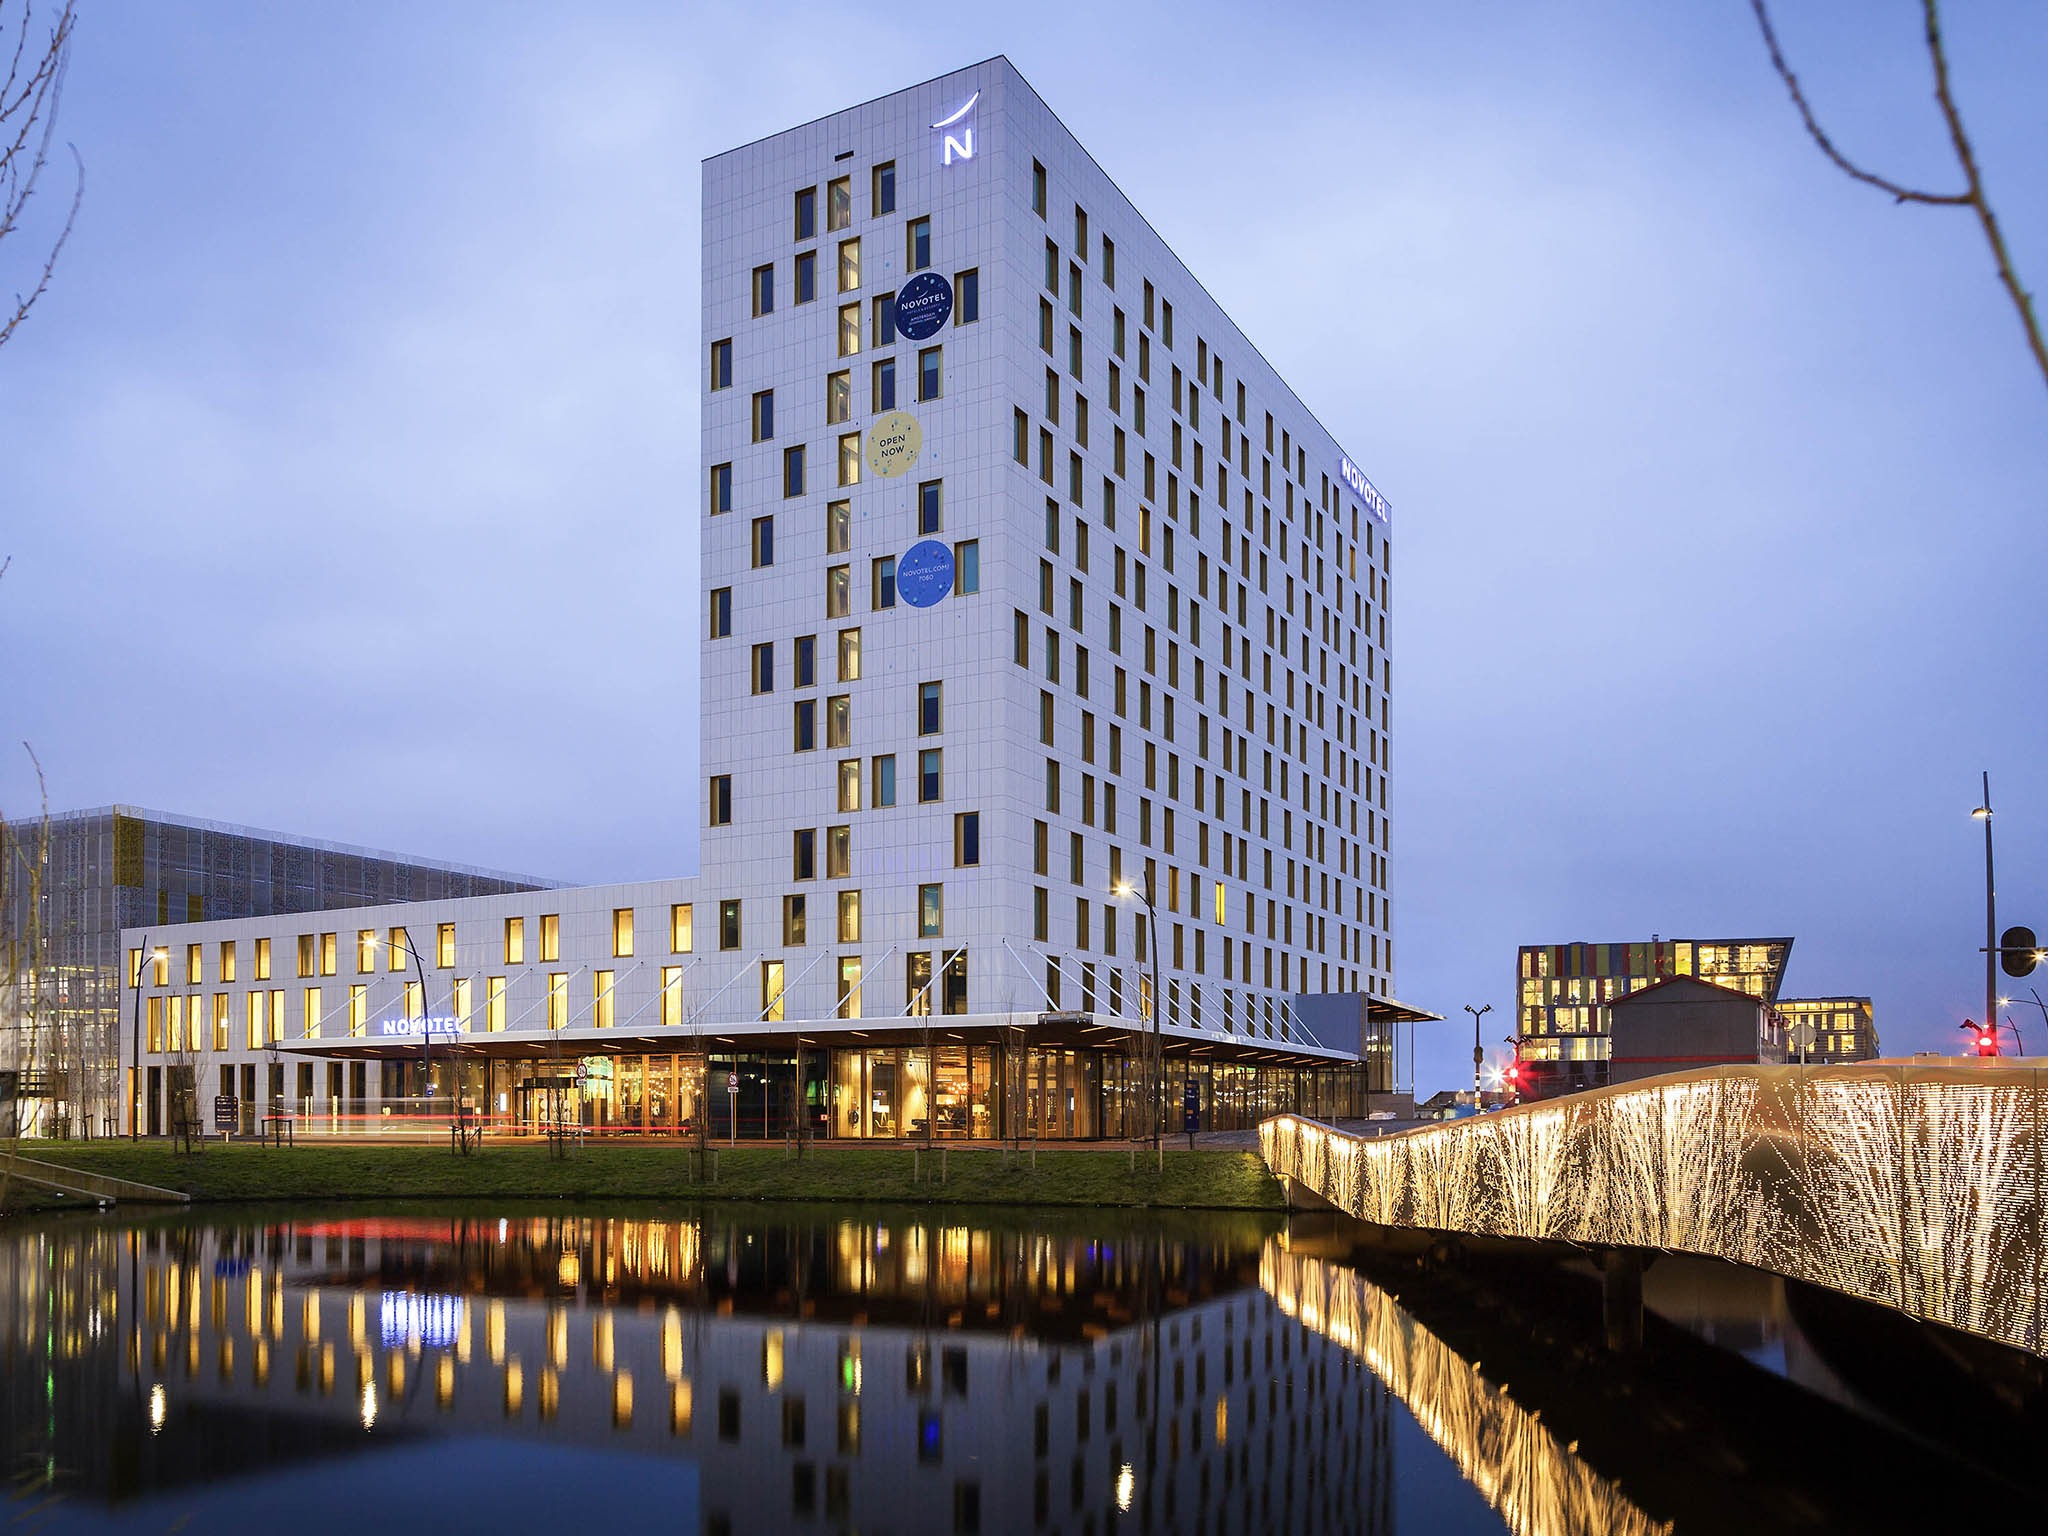 فندق - نوفوتيل Novotel أمستردام شيبول إيربورت